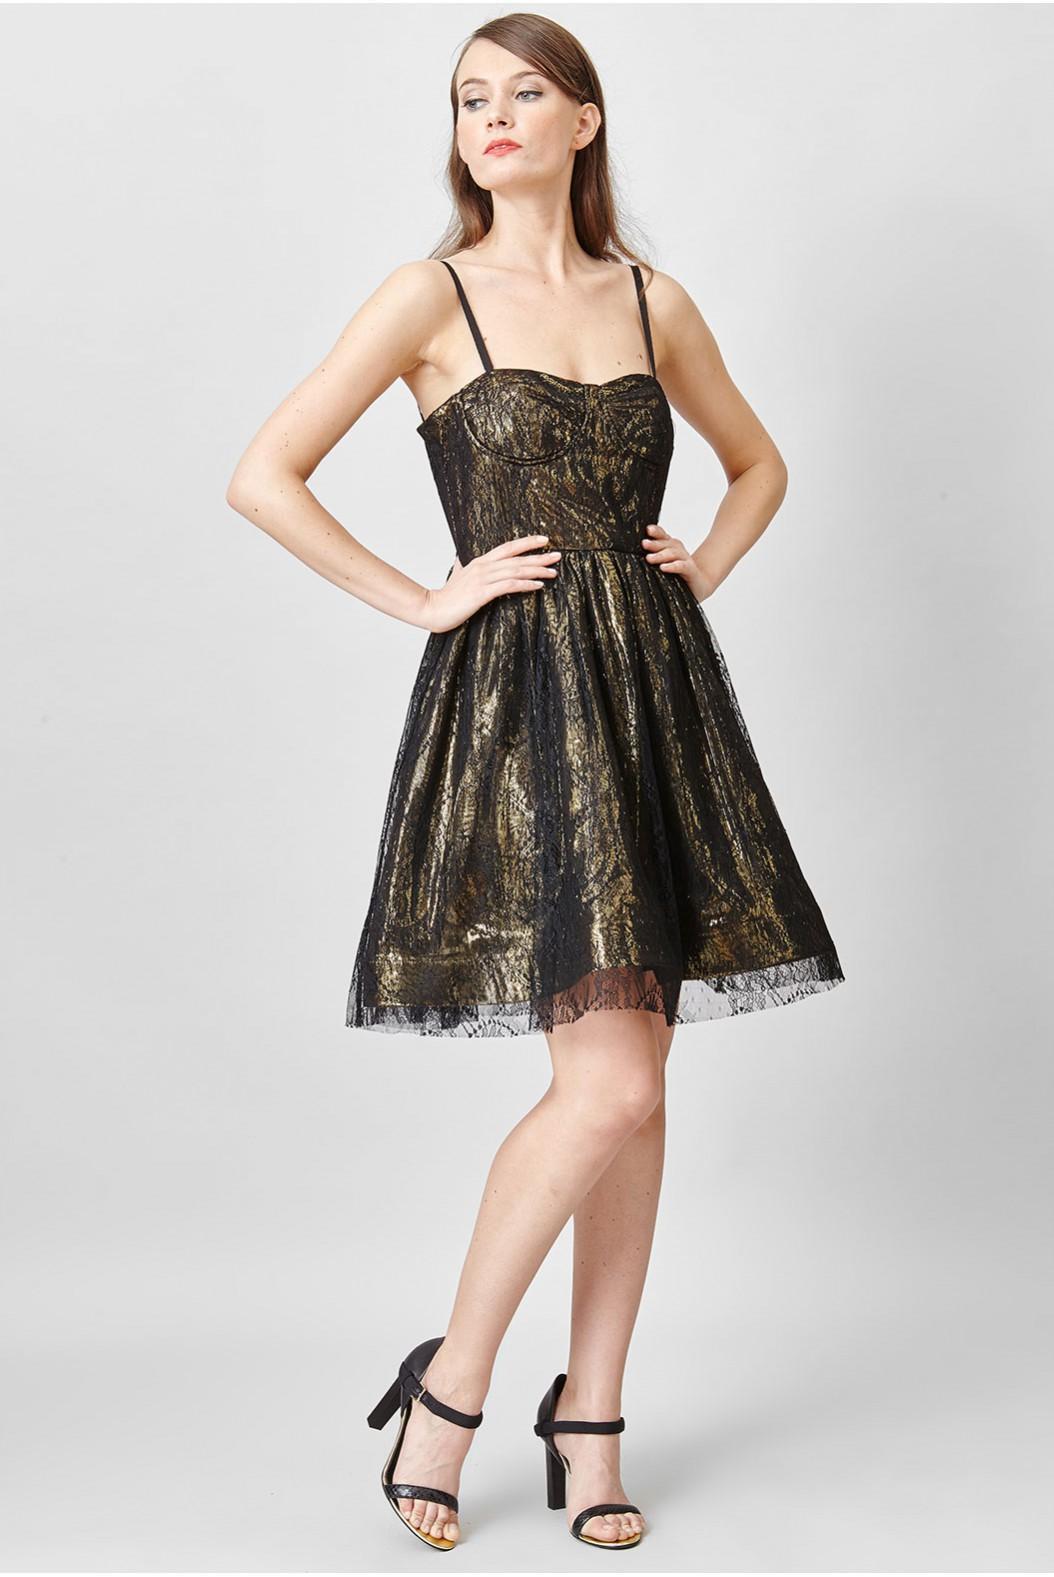 Robe noir et dorée